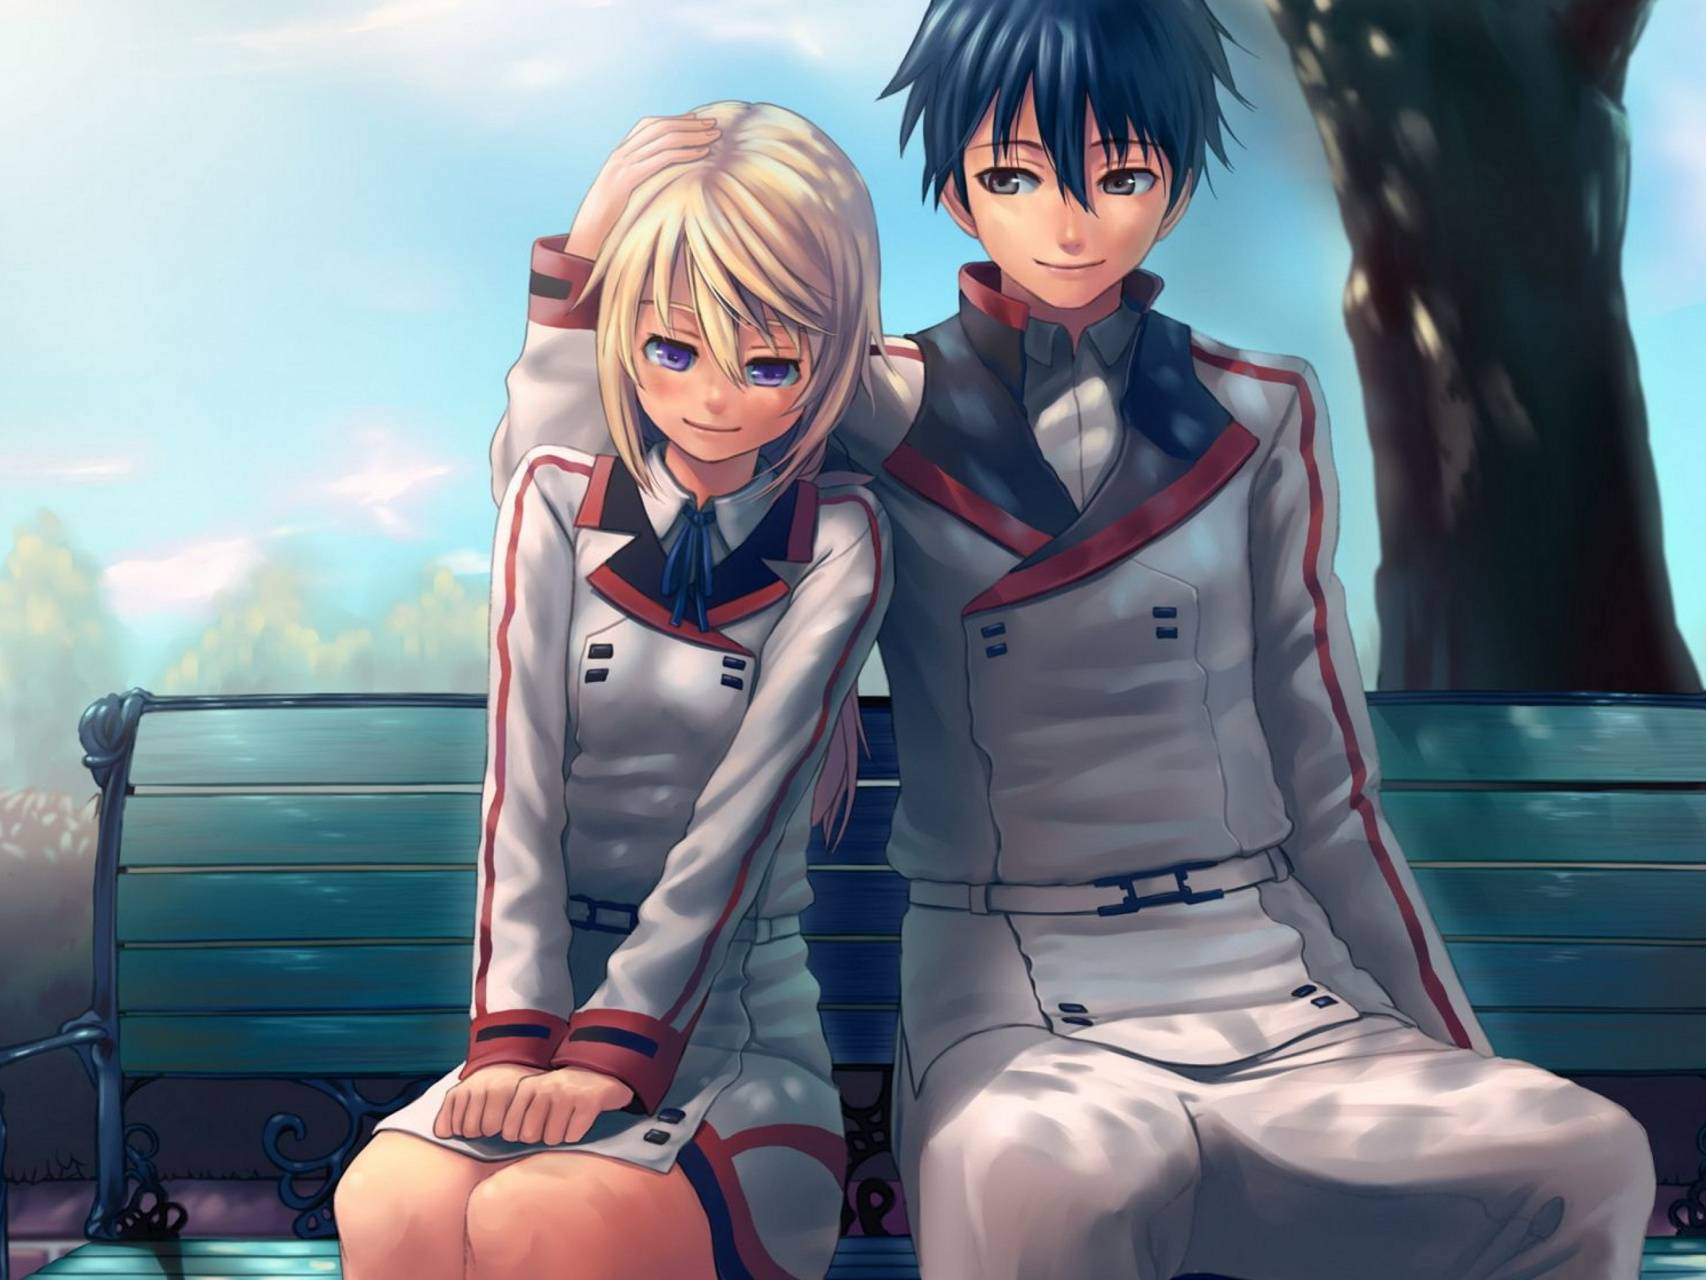 Hd Anime